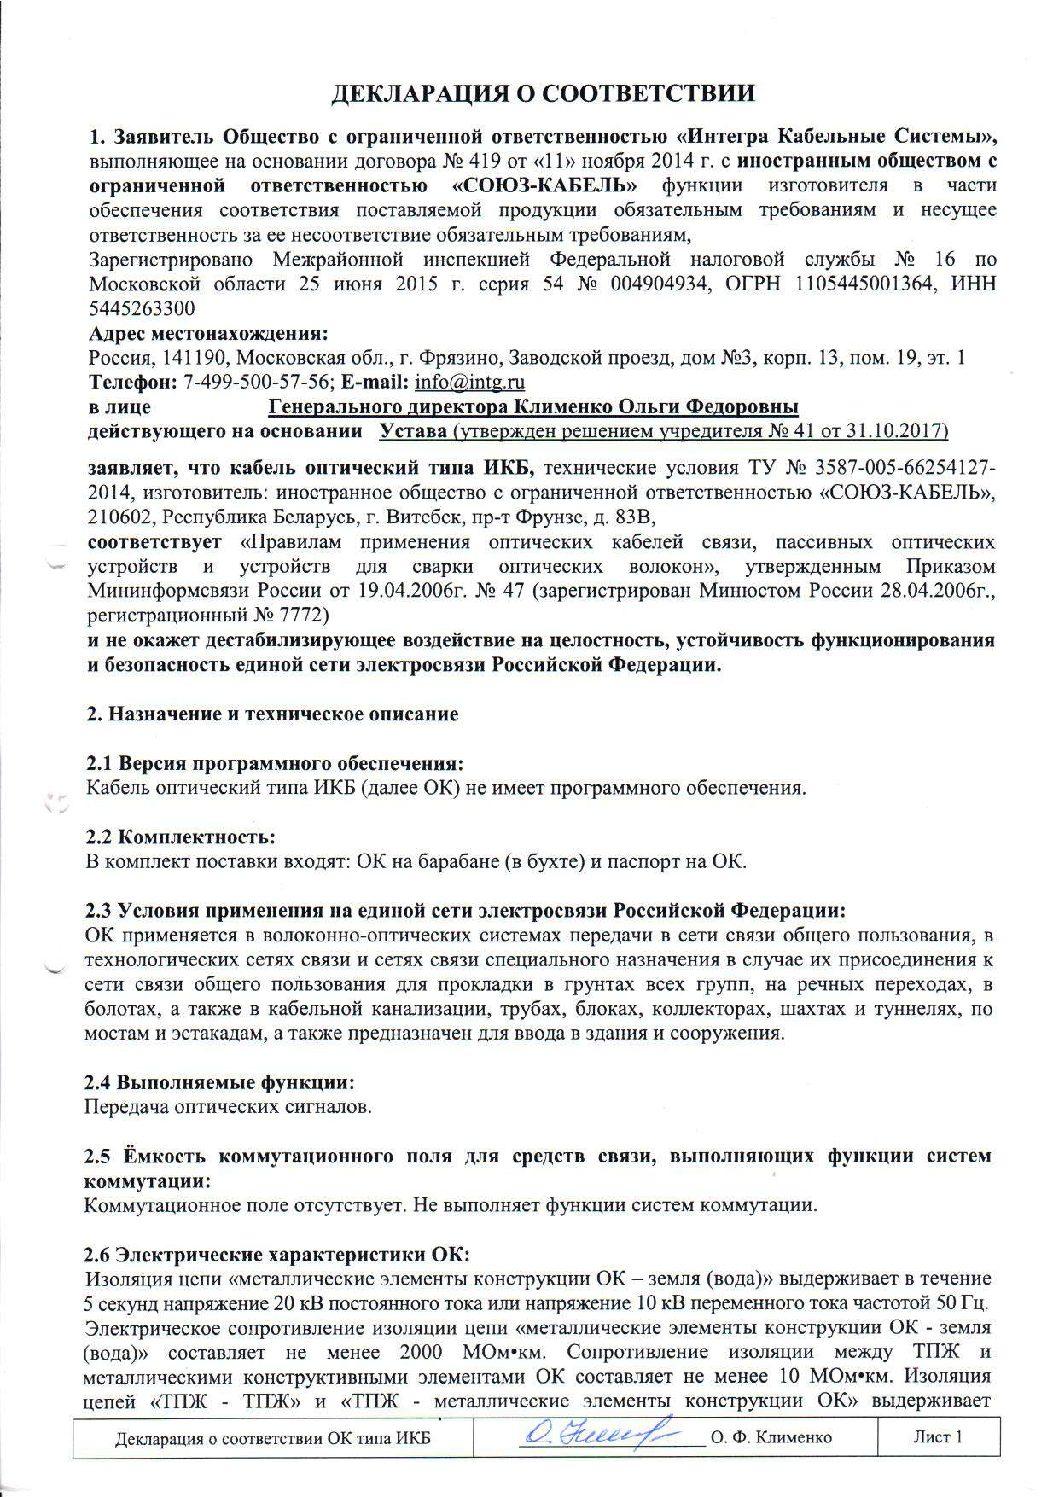 Declaration IKB